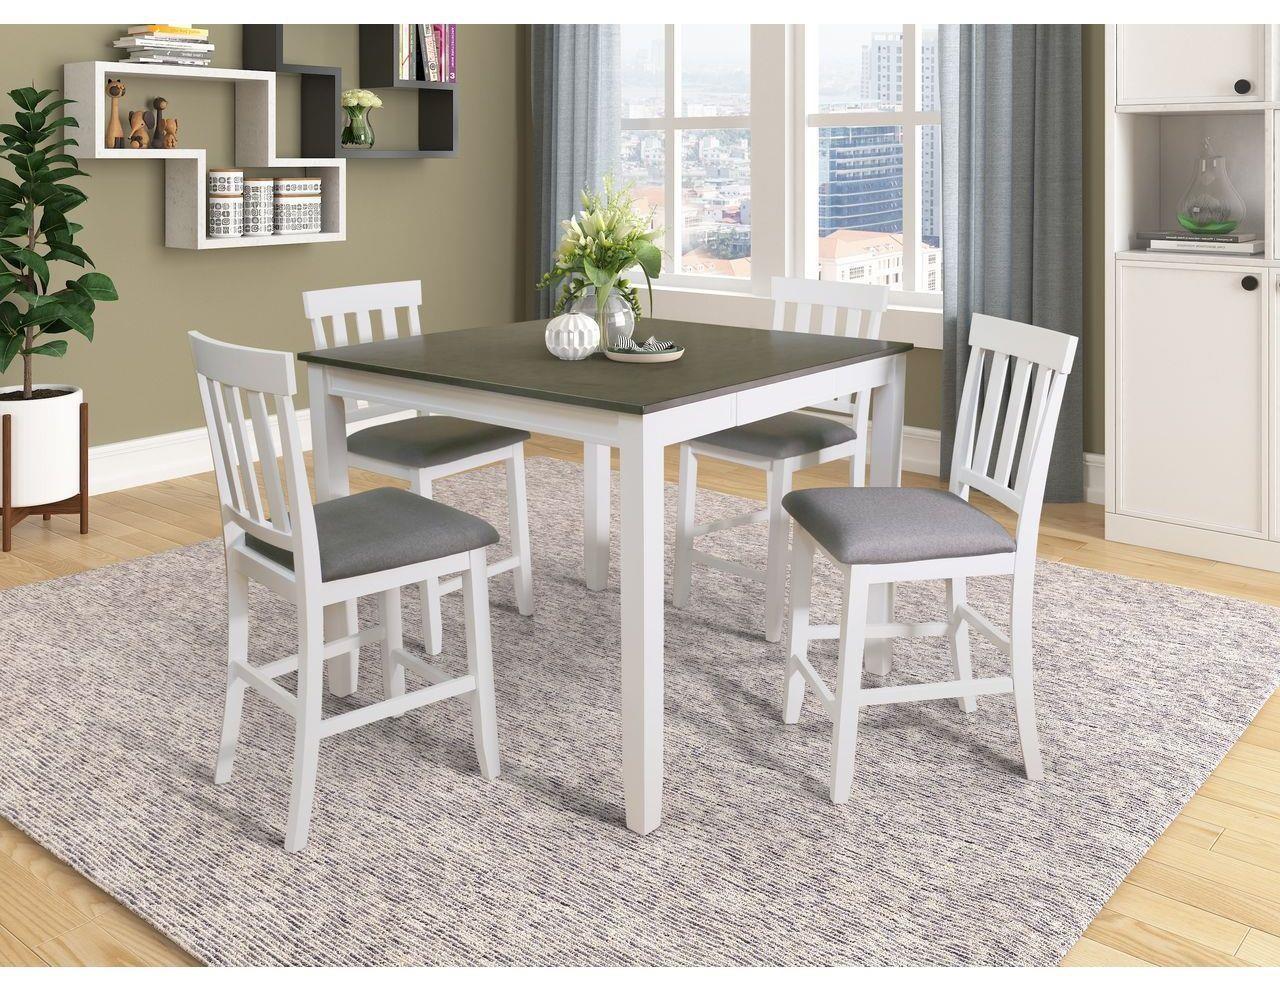 8652P WHITE/ GREY PUB TABLE X 4 STOOLS by Lifestyle at Furniture Fair - North Carolina